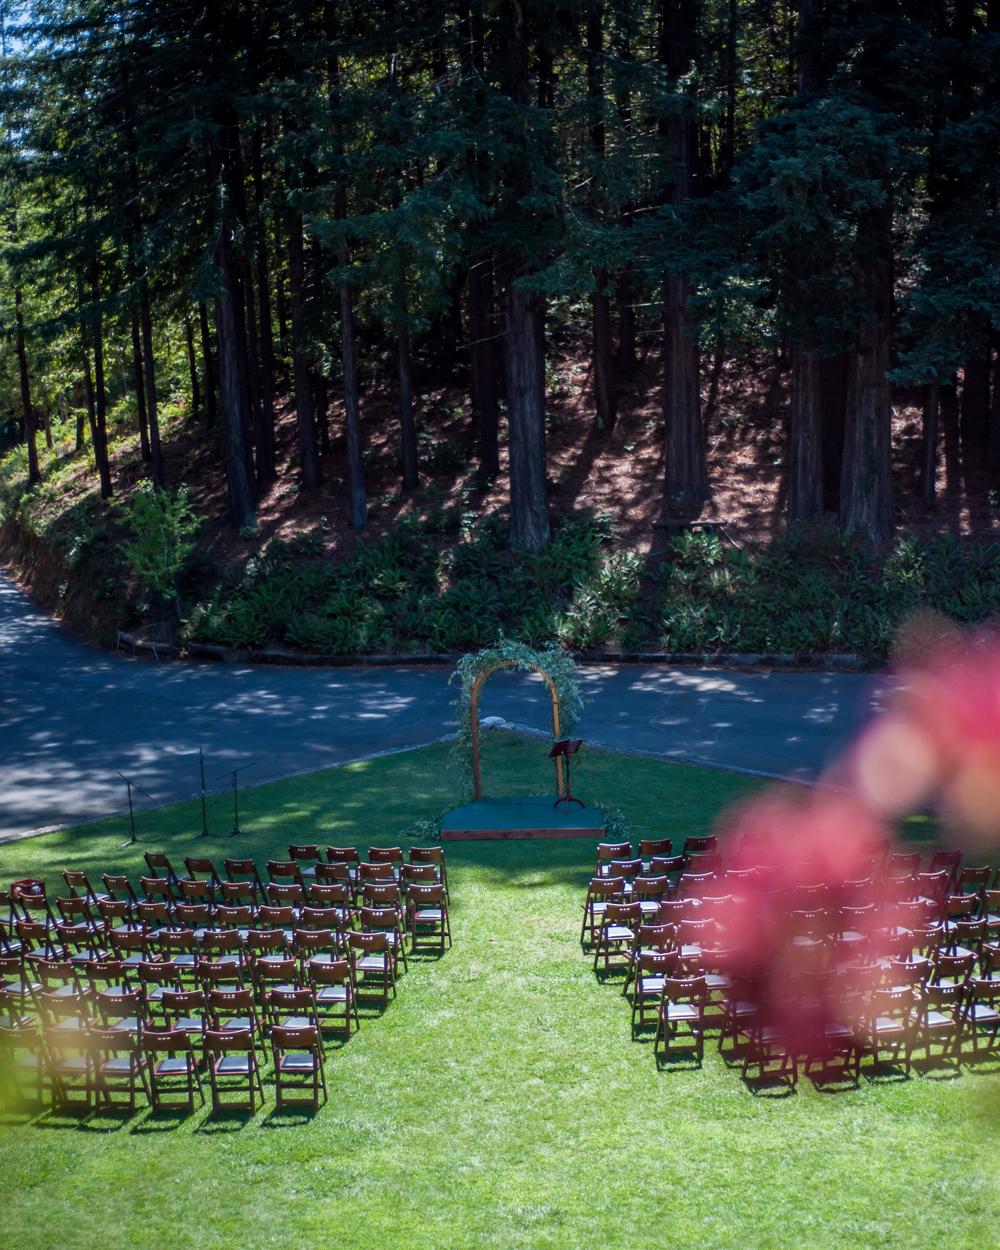 ralston-white-retreat-mill-valley-wedding-photography-lilouette-02.jpg